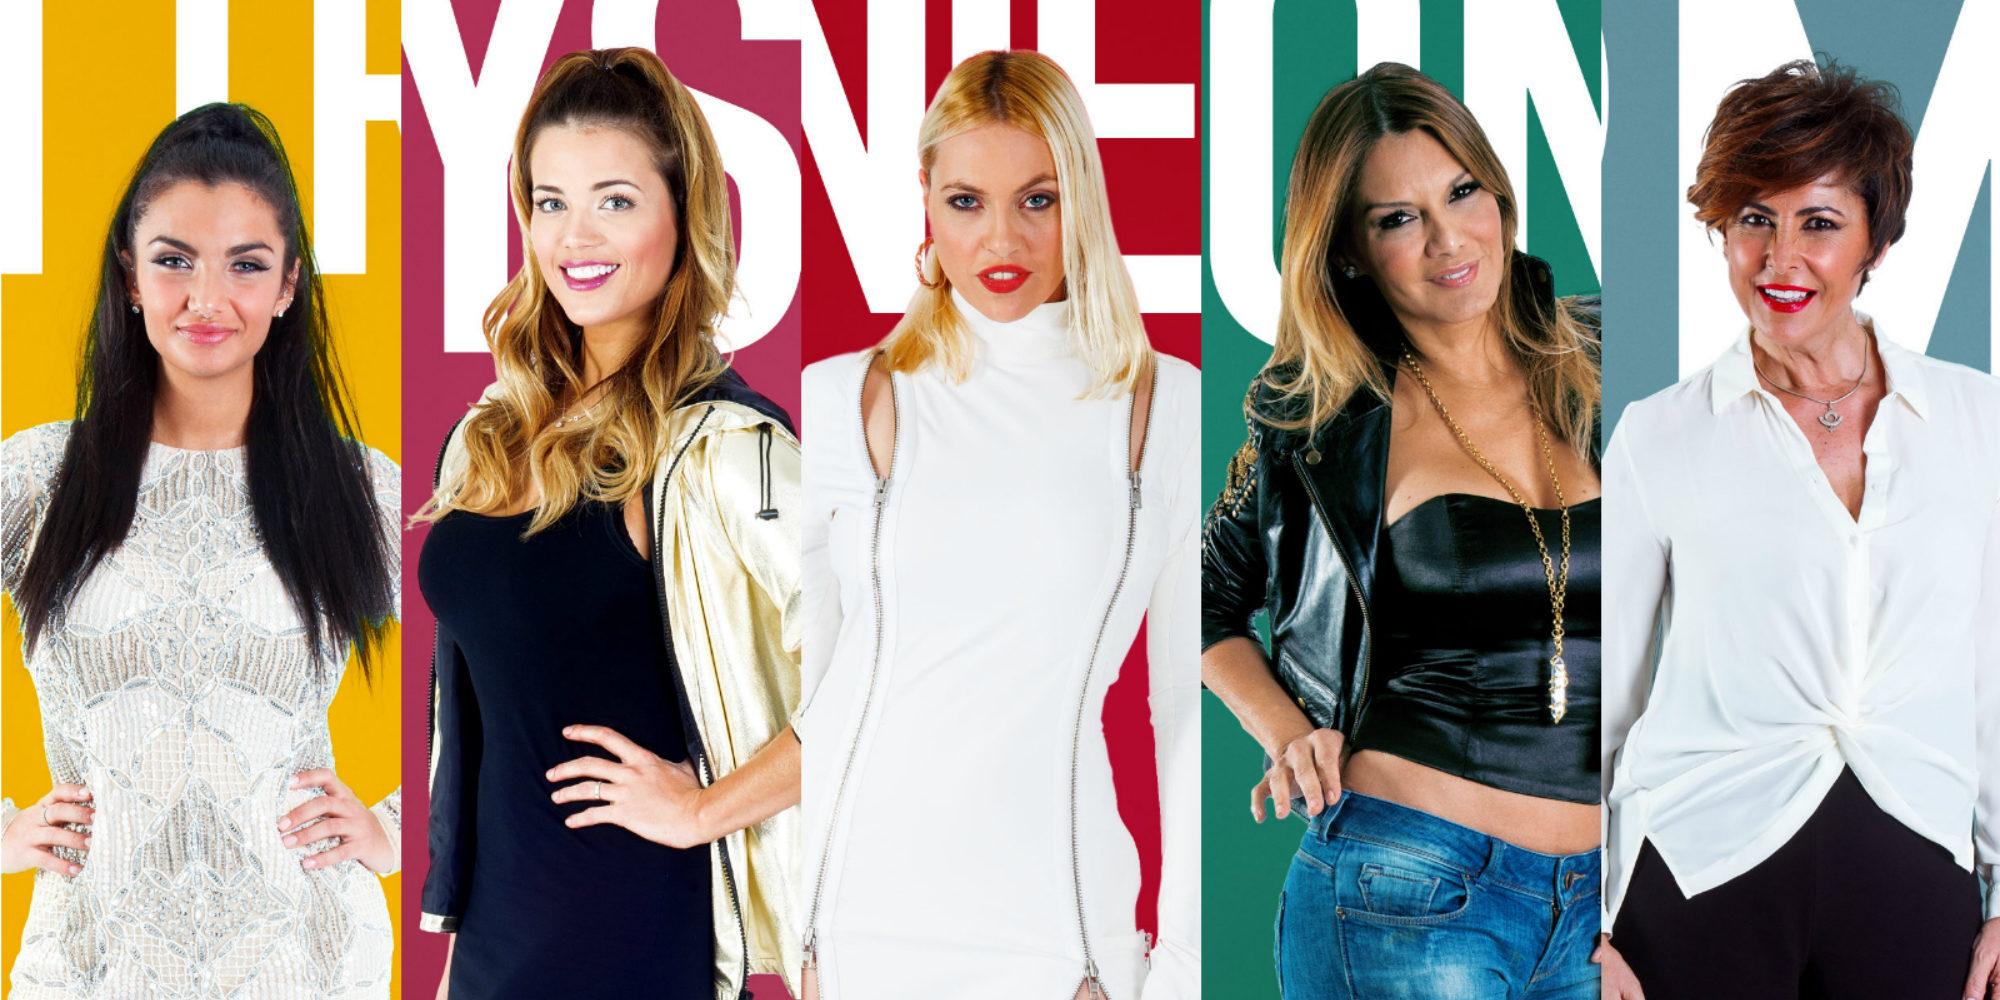 Elettra, Alyson, Daniela, Irma e Ivonne son las nuevas nominadas de 'GH VIP 5'